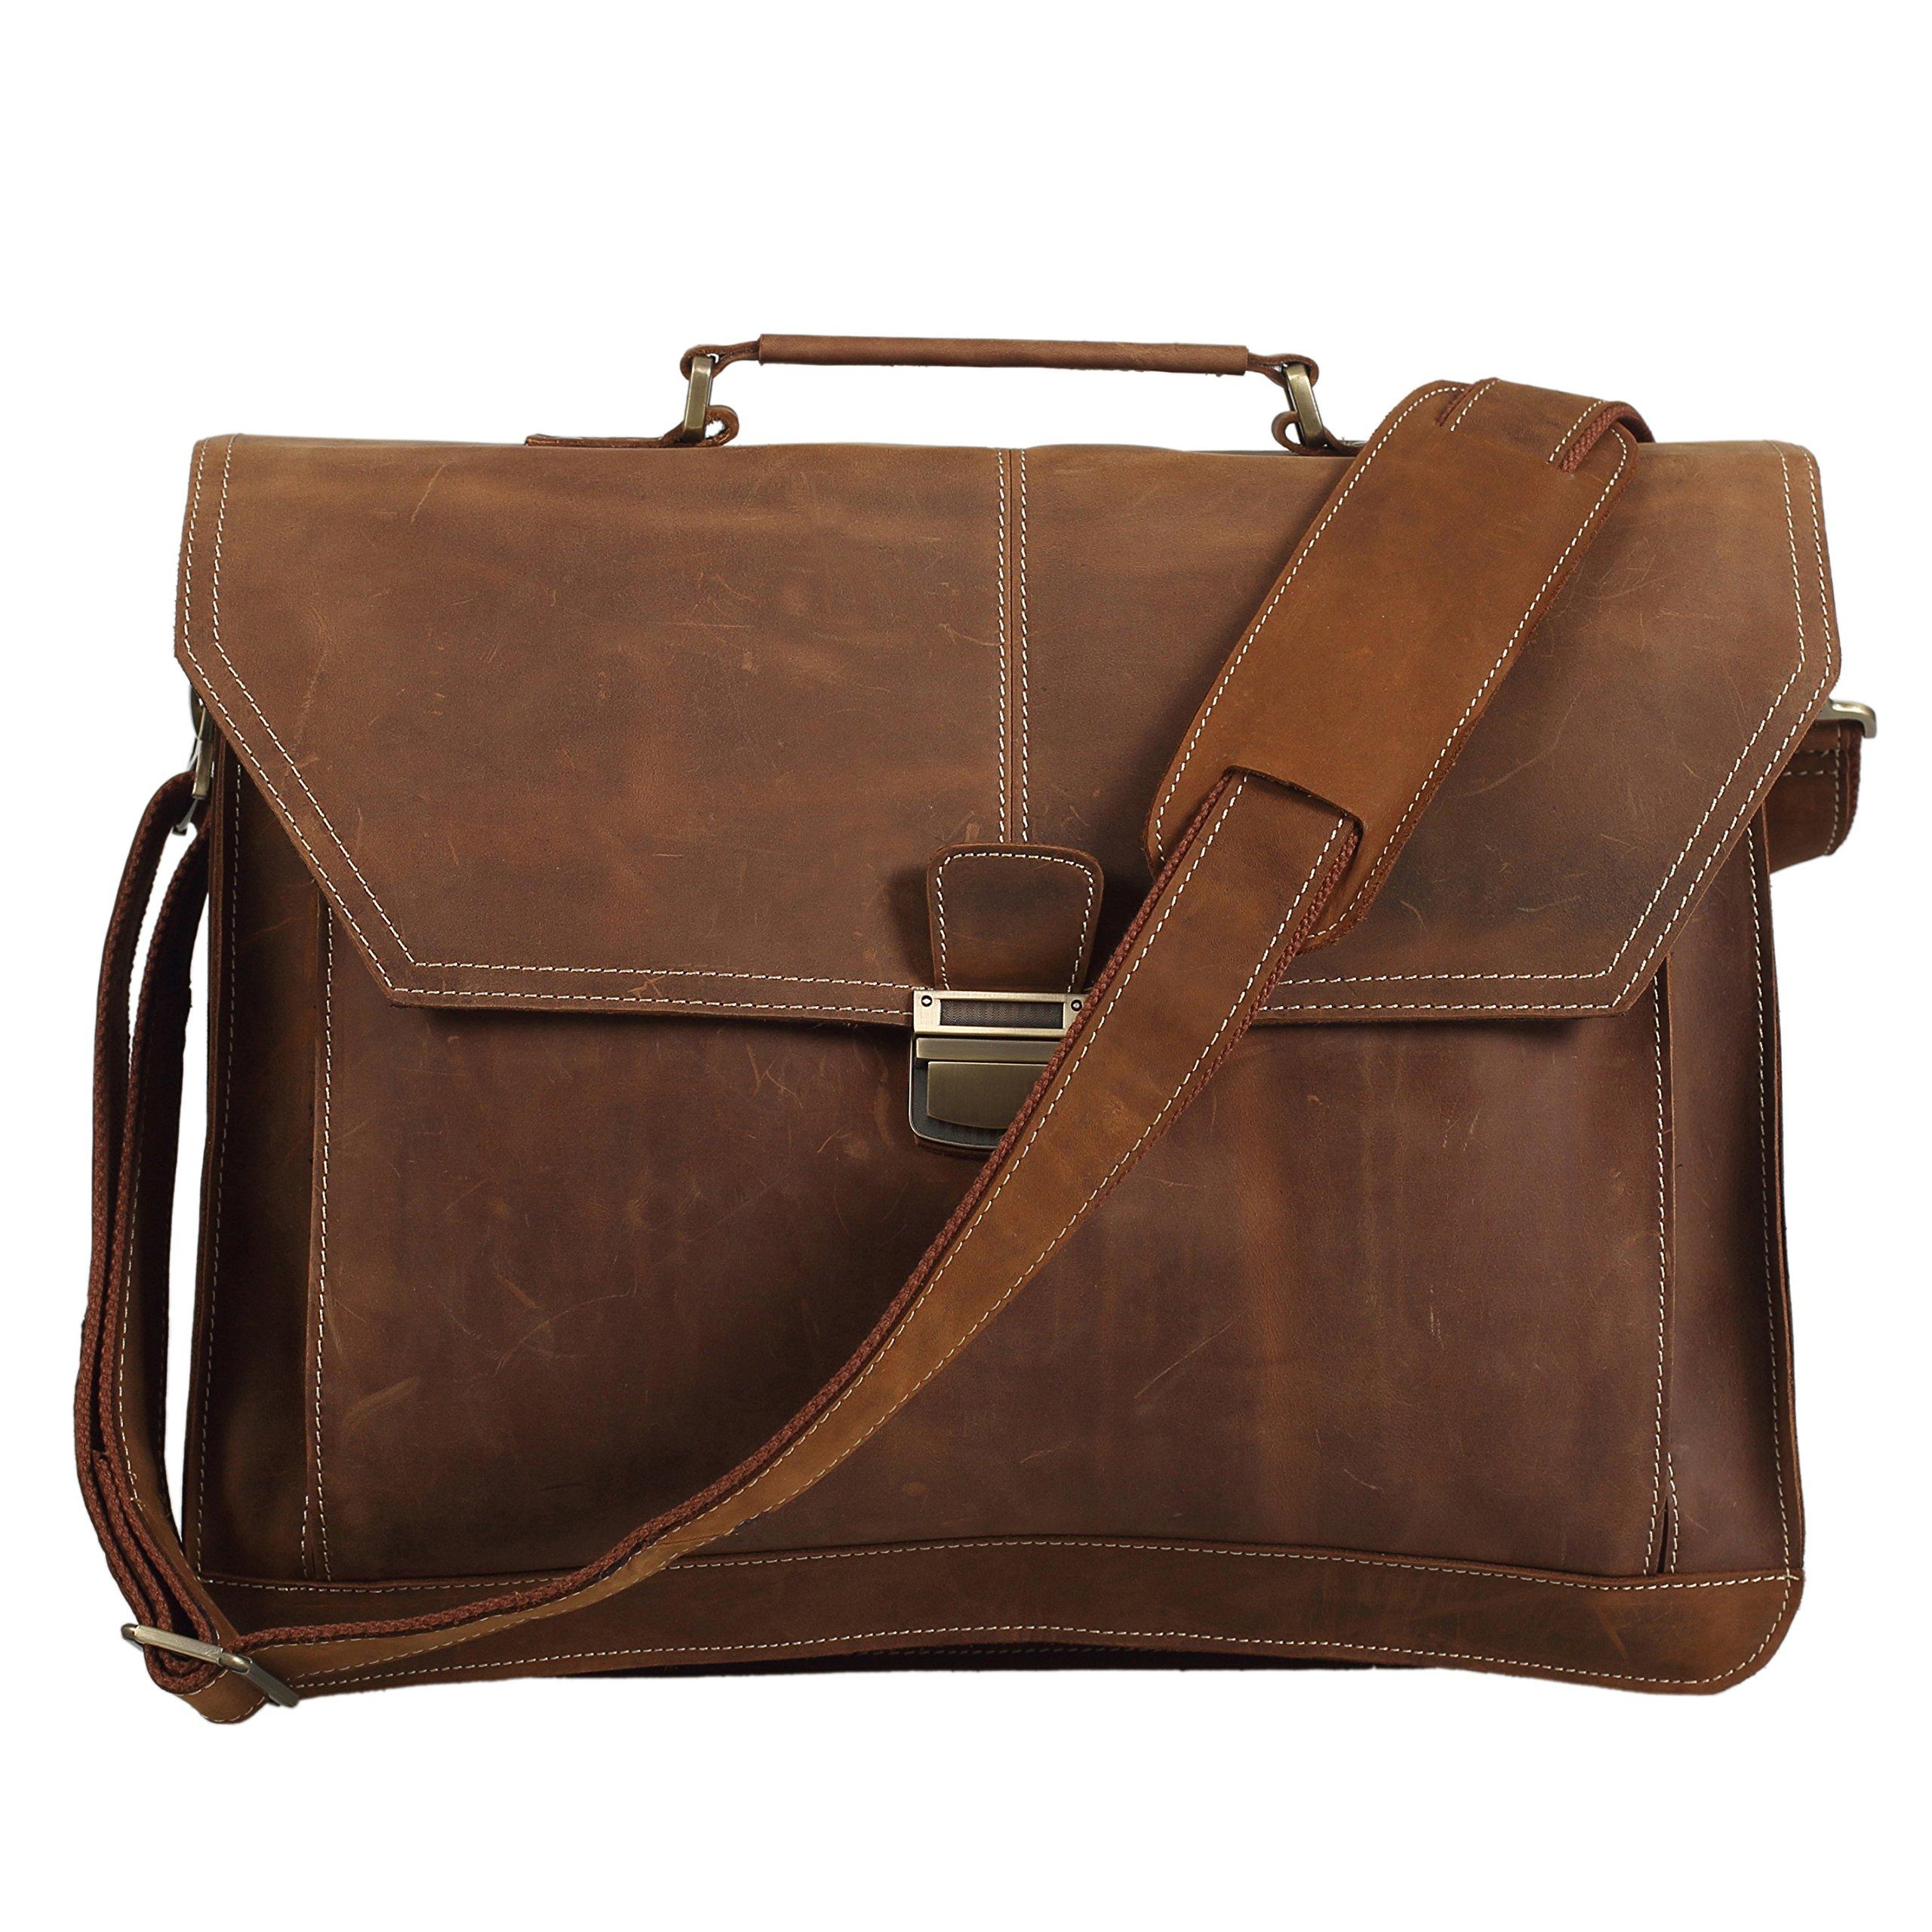 Polare Leather Men's Briefcase/laptop/messenger Bag/satchel Fit 16.5 Inch Laptop Tote